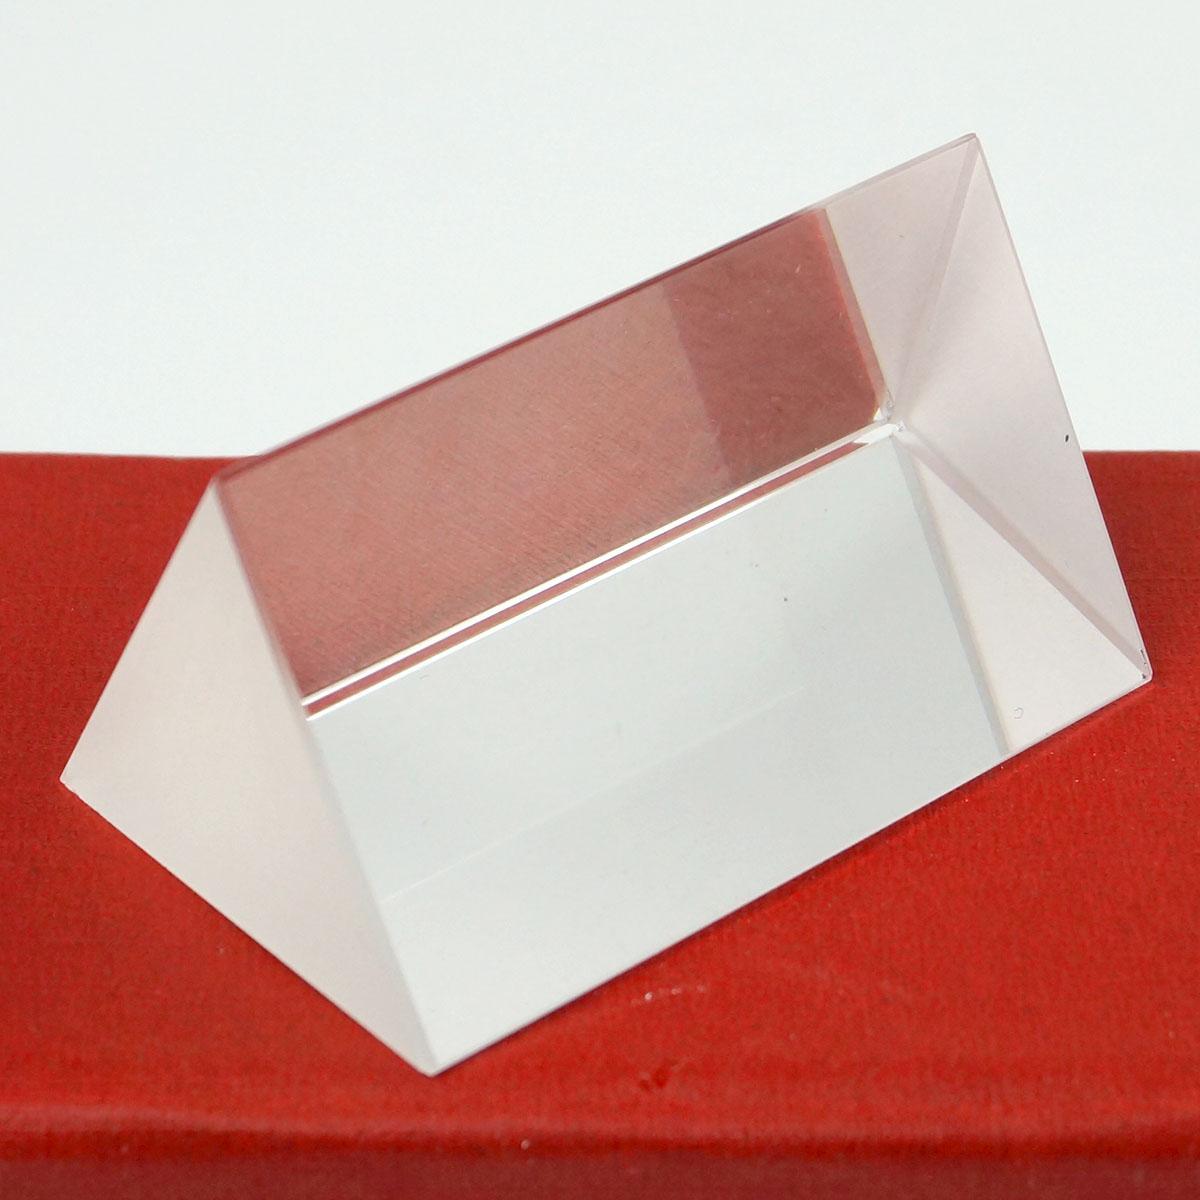 30x30x50mm K9 Crystal Triangular Prism for Teaching Light Spectrum Physics Photo Optical Instruments Rainbow Experiment